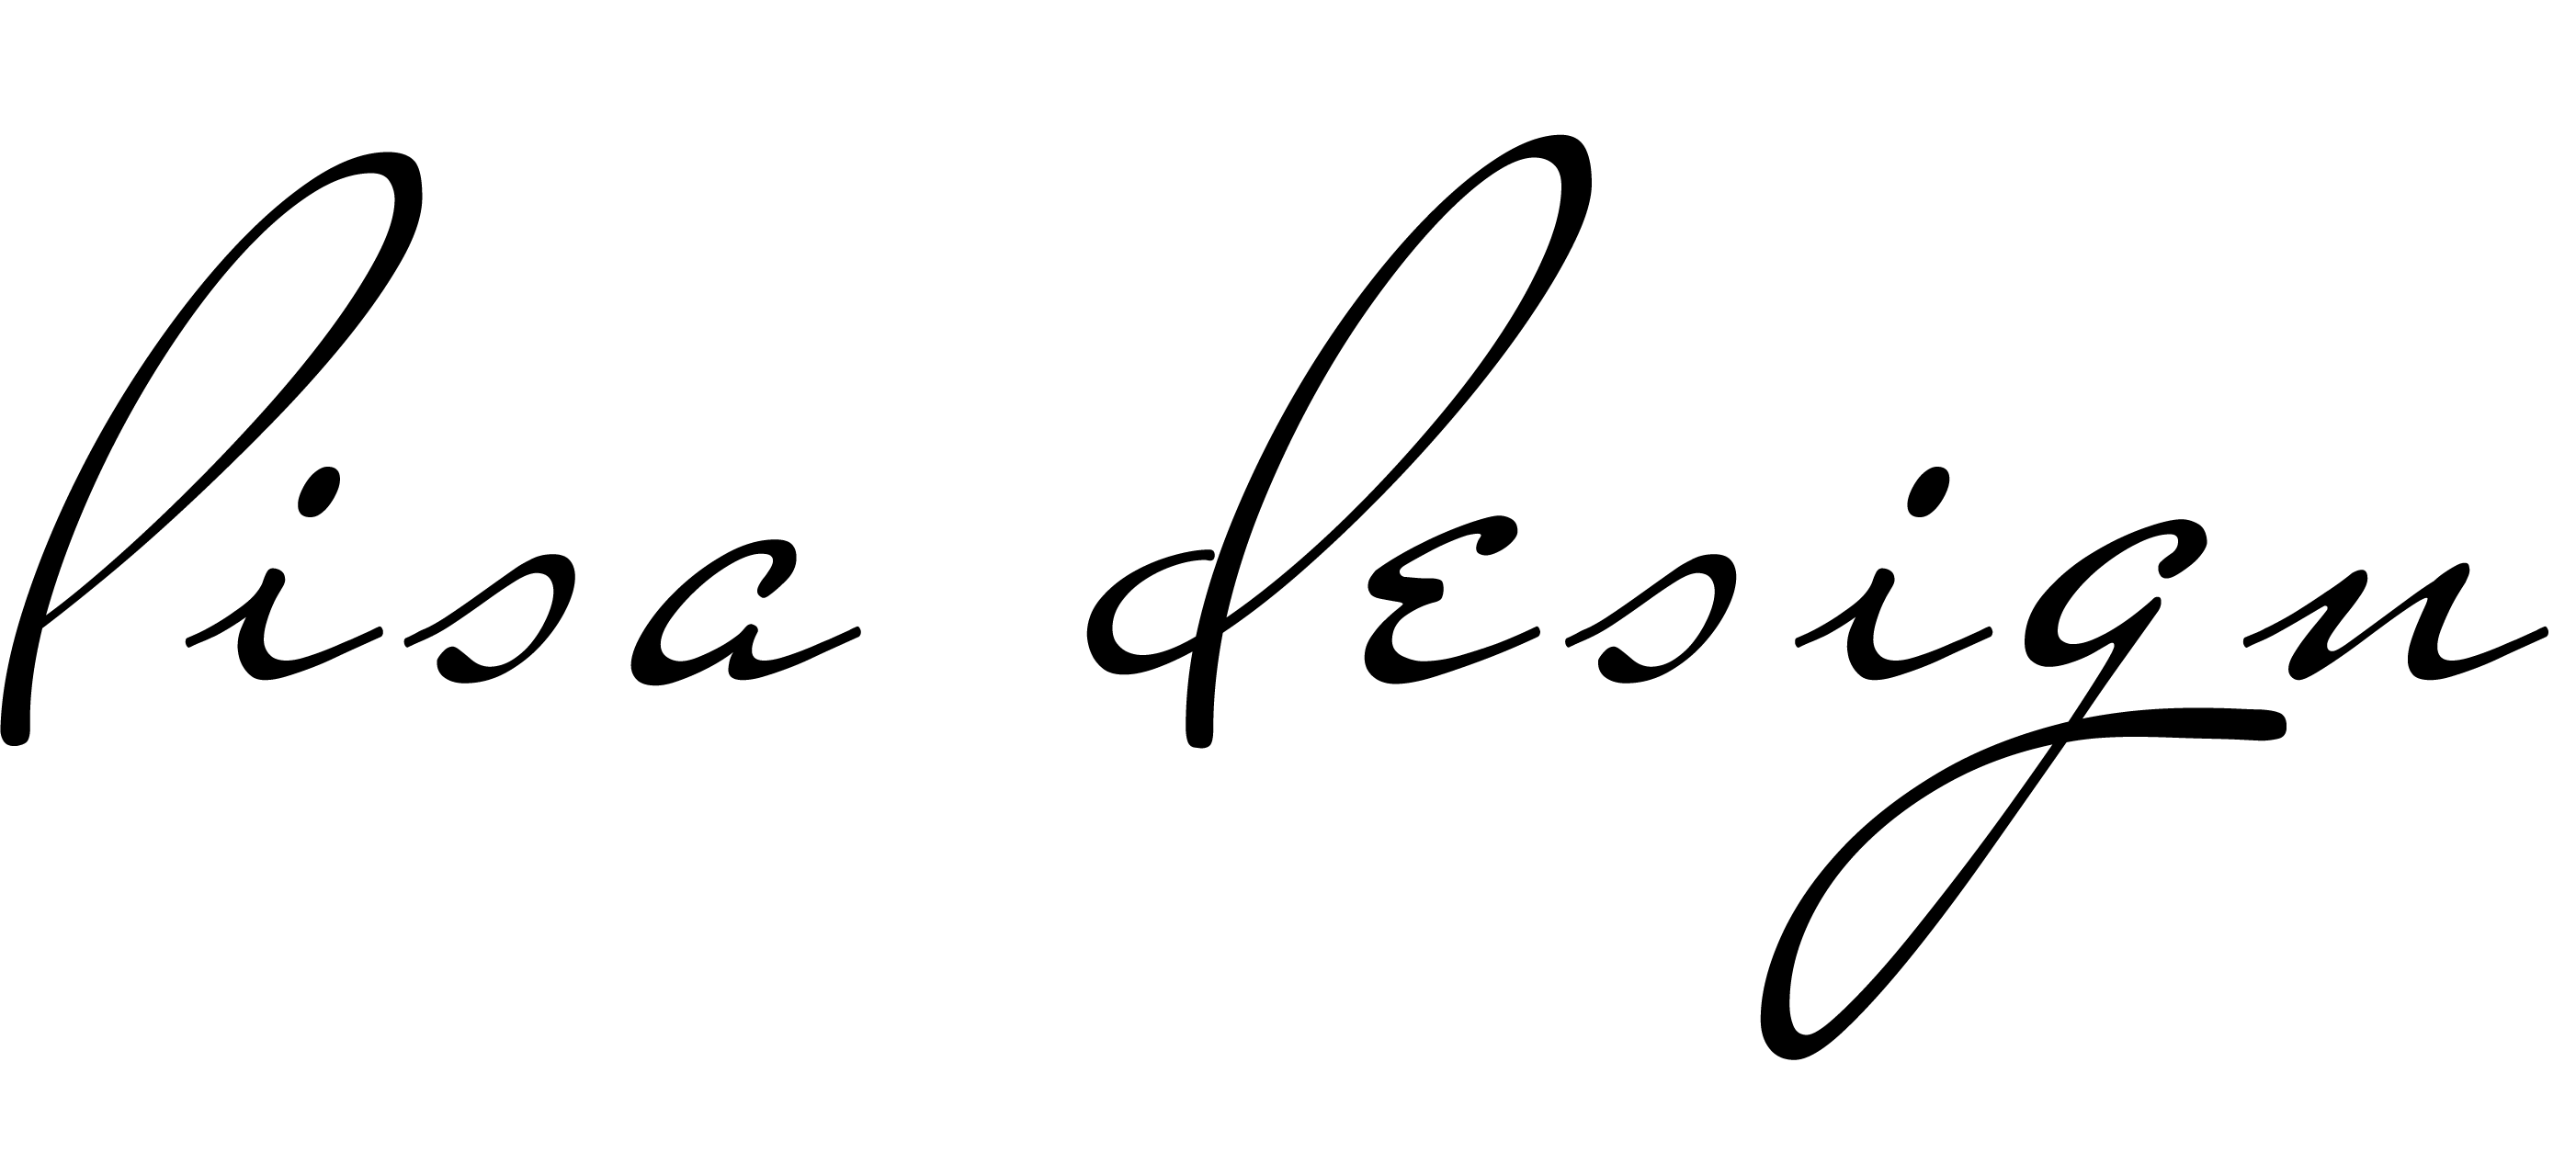 lisa design(リサデザイン)